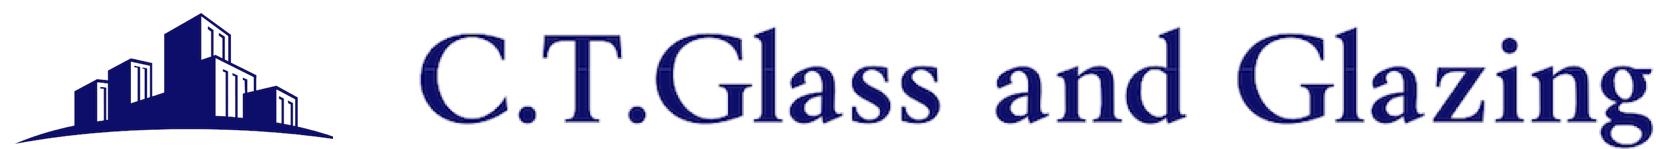 CT Glass and Glazing